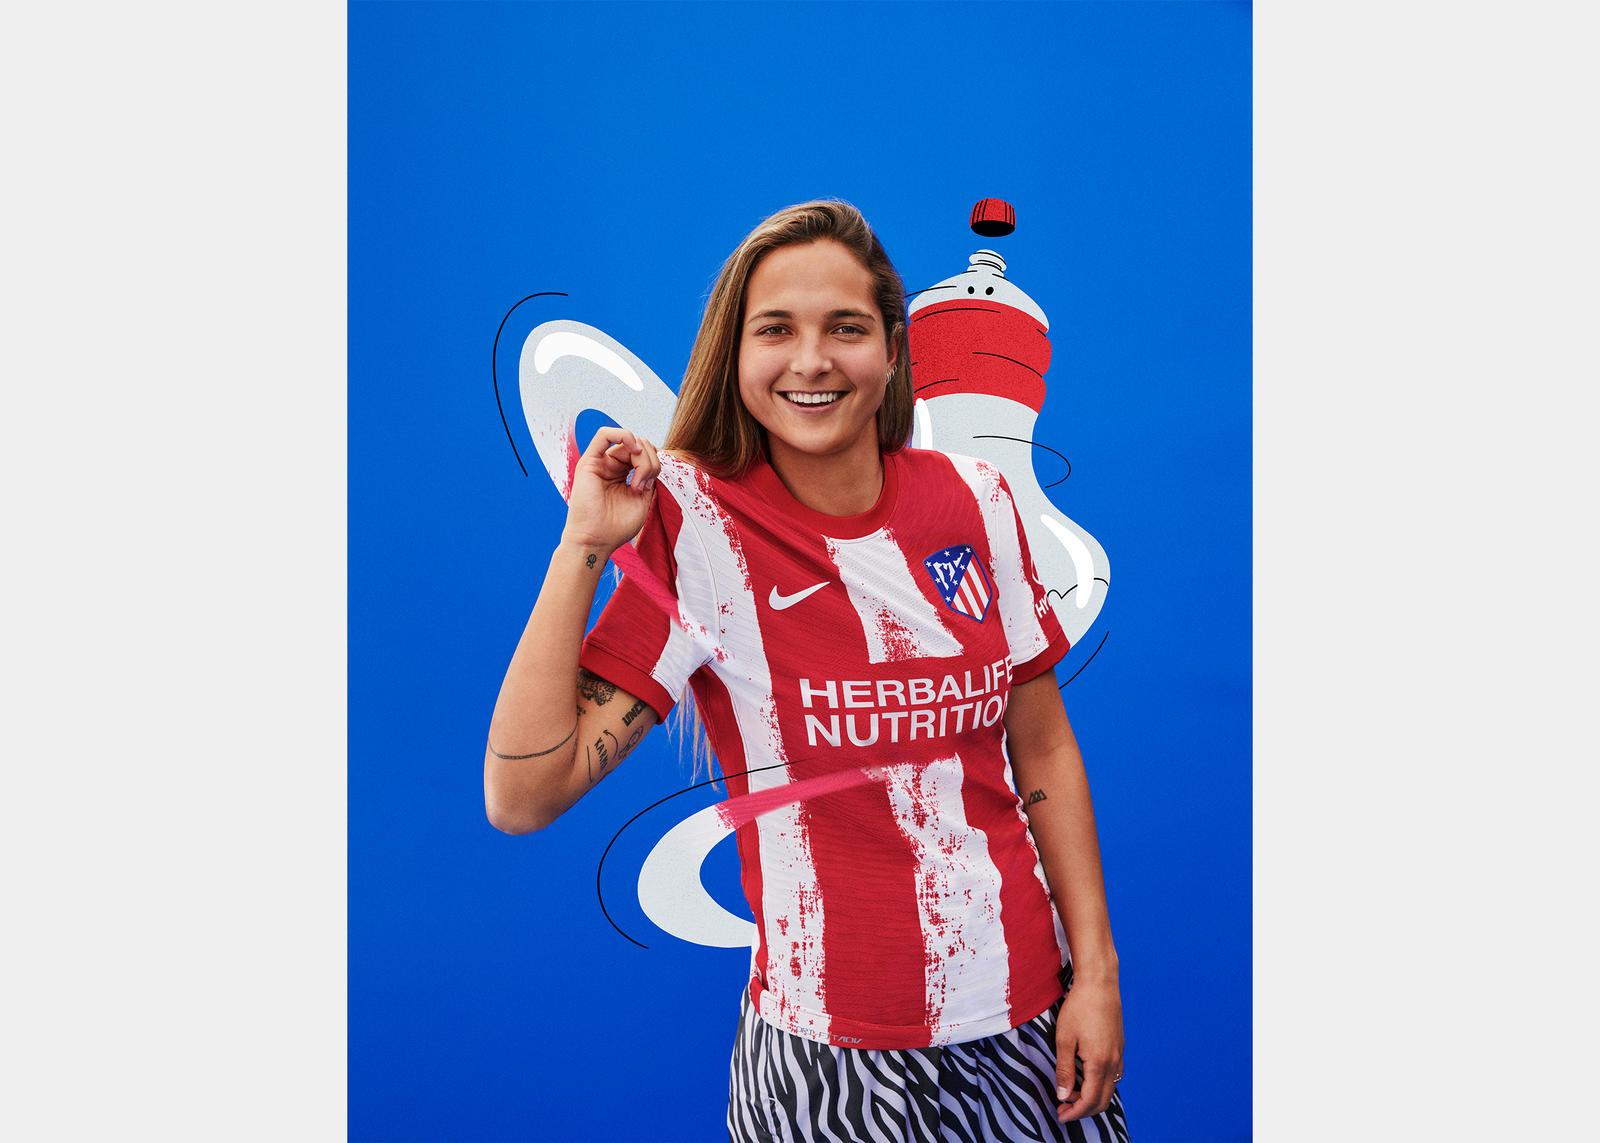 Atlético de Madrid 2021-22 Home Kit 1